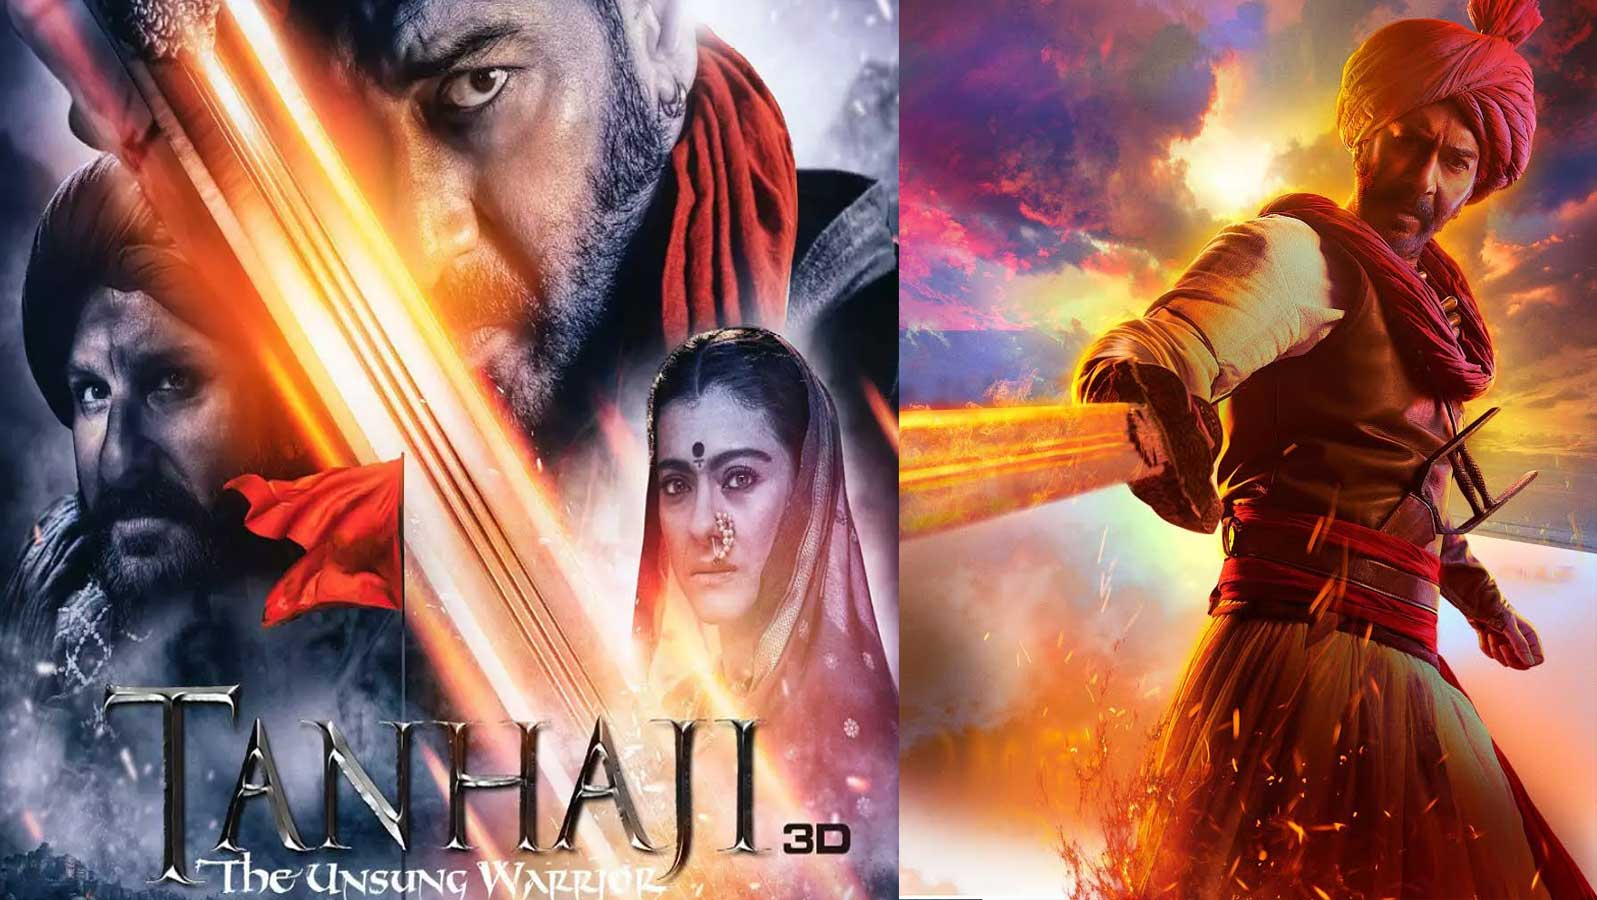 3D Monster Pon 'tanhaji: the unsung warrior' starring ajay devgn, kajol, saif ali khan  mints rs 15.10 crore on opening day